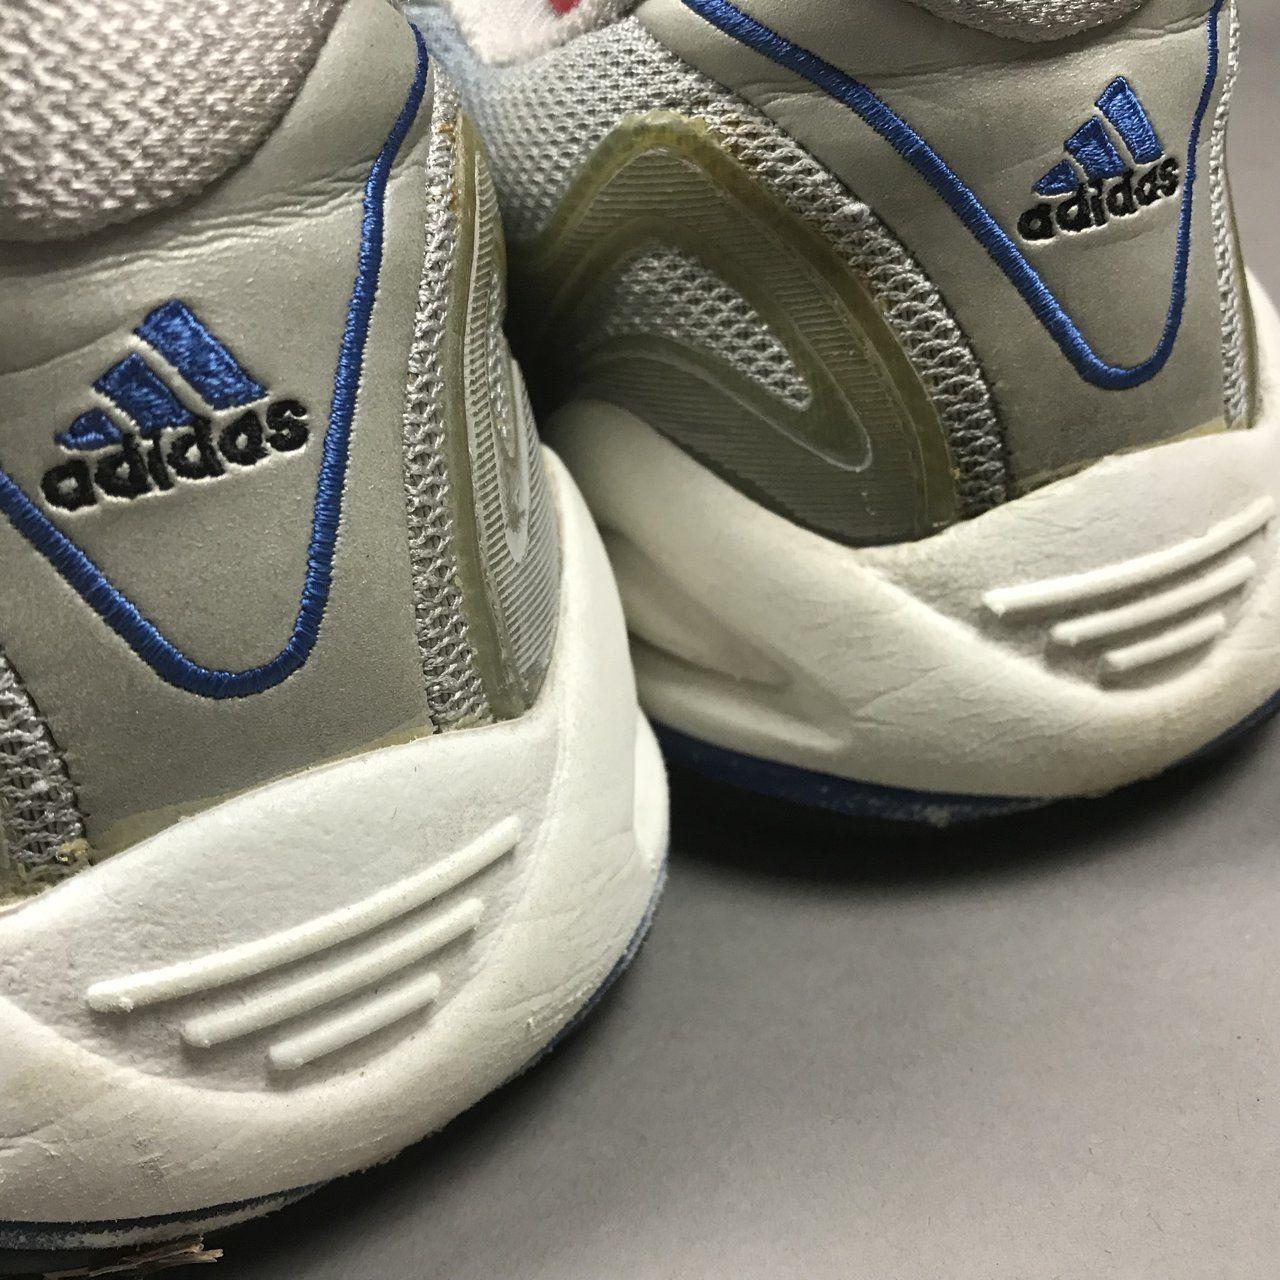 Vintage Adidas eqt 2001 3m 3 | Vintage adidas, Adidas, Vintage